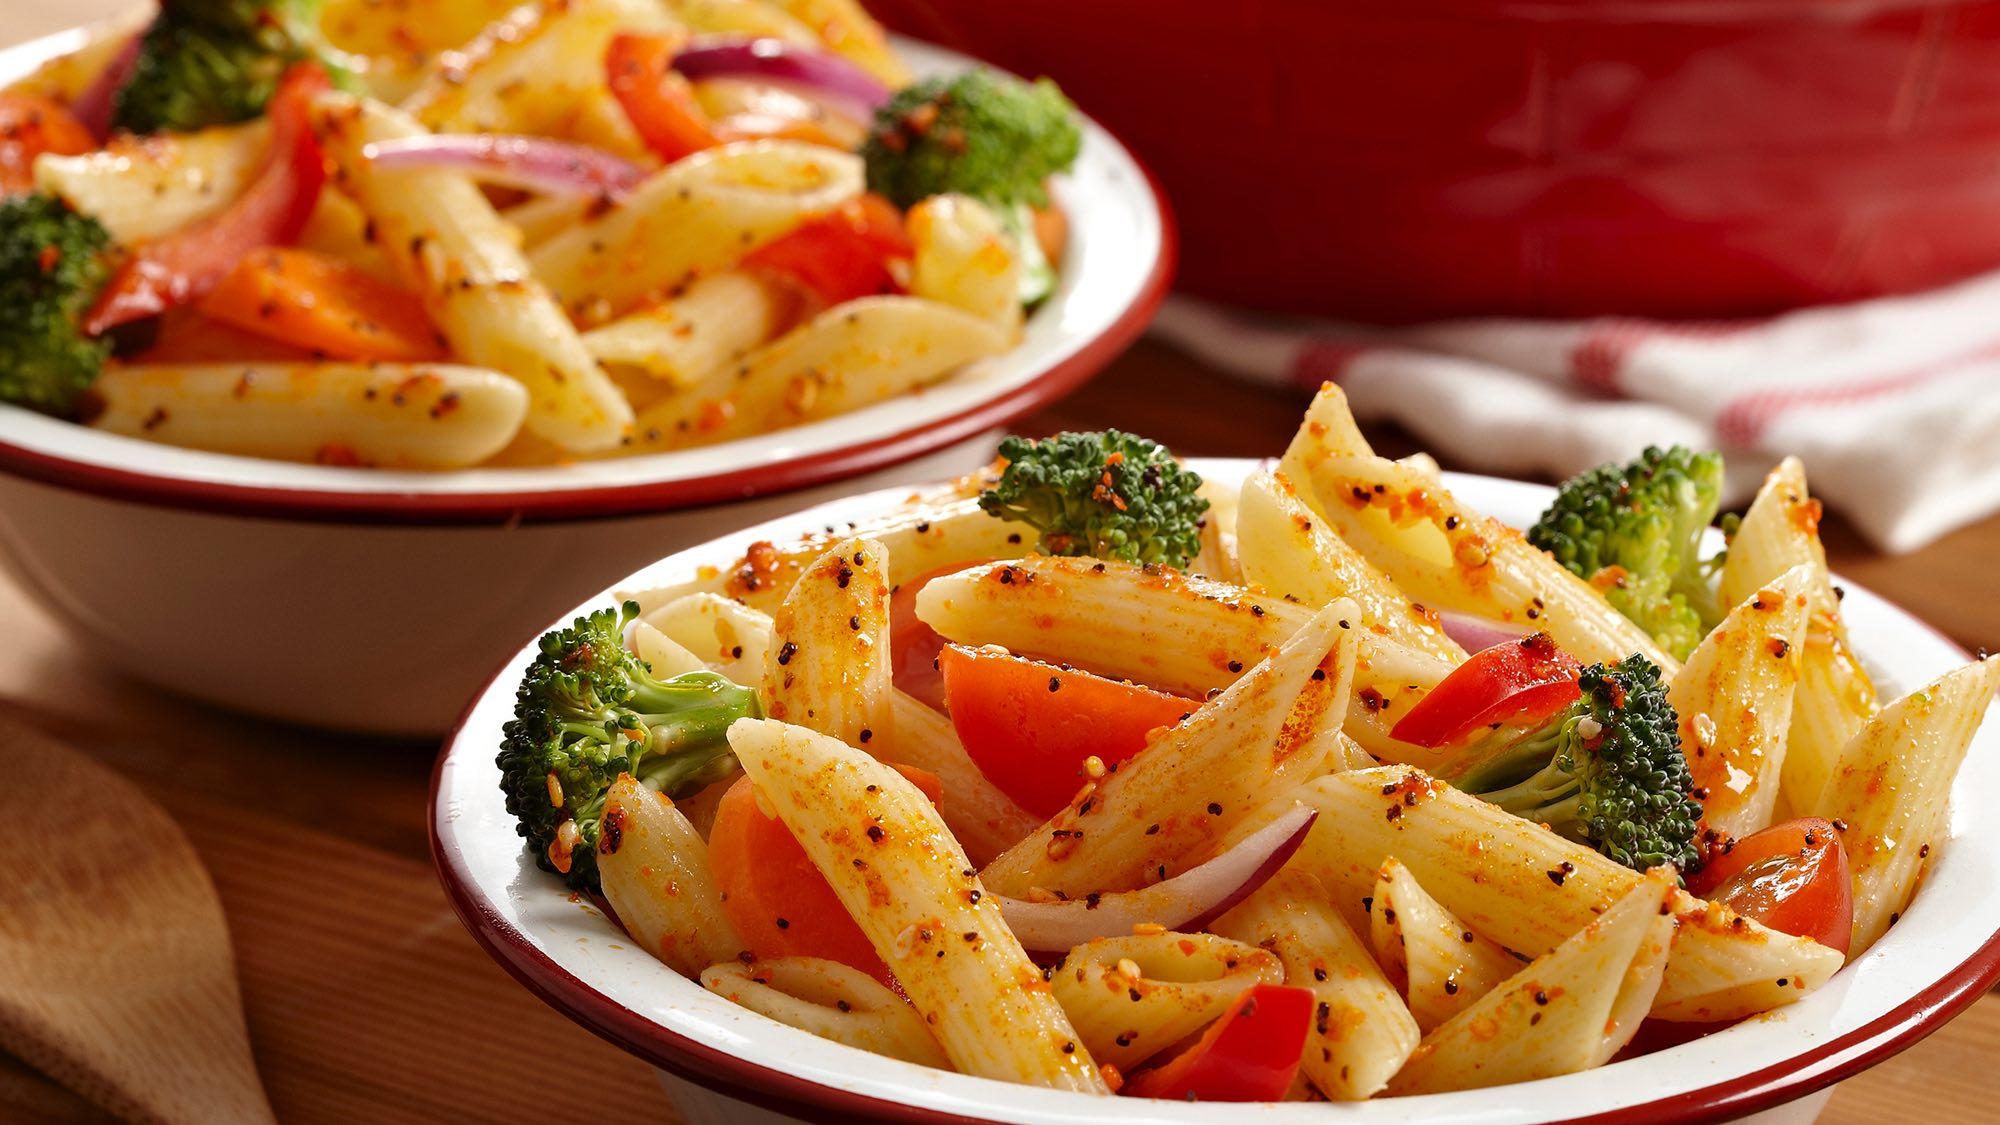 McCormick Supreme Pasta Salad